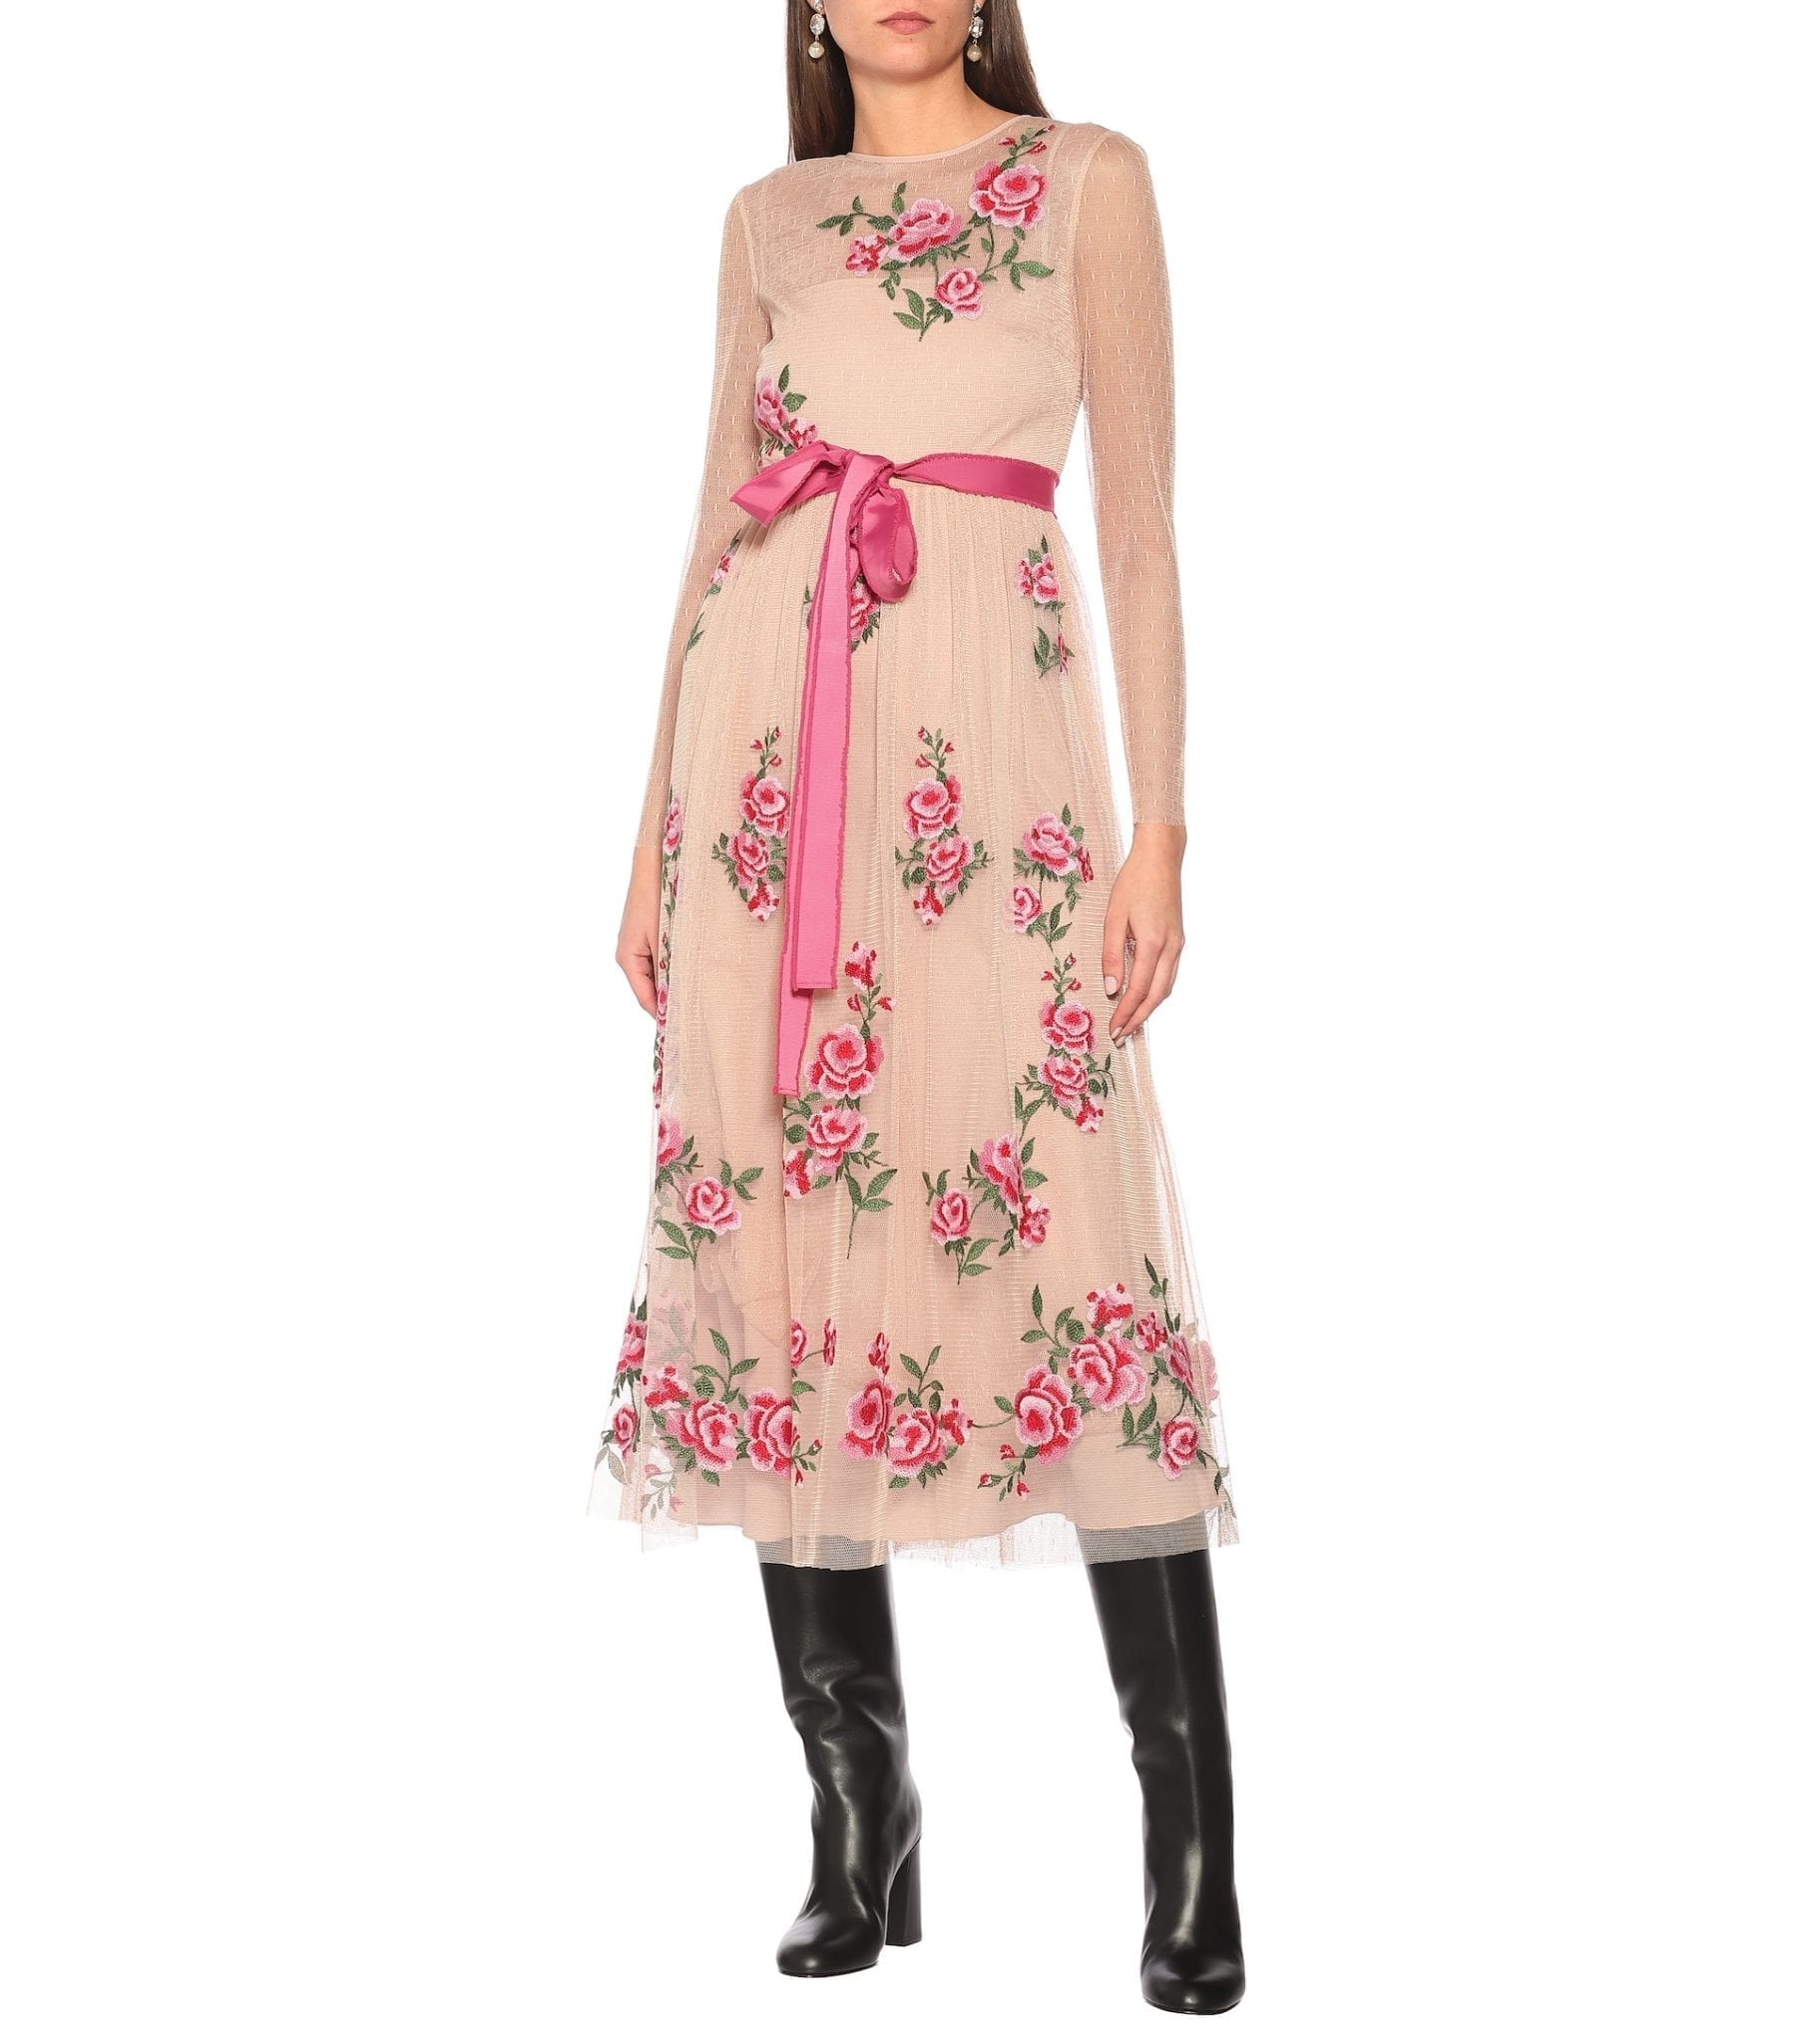 REDVALENTINO Floral Midi Dress